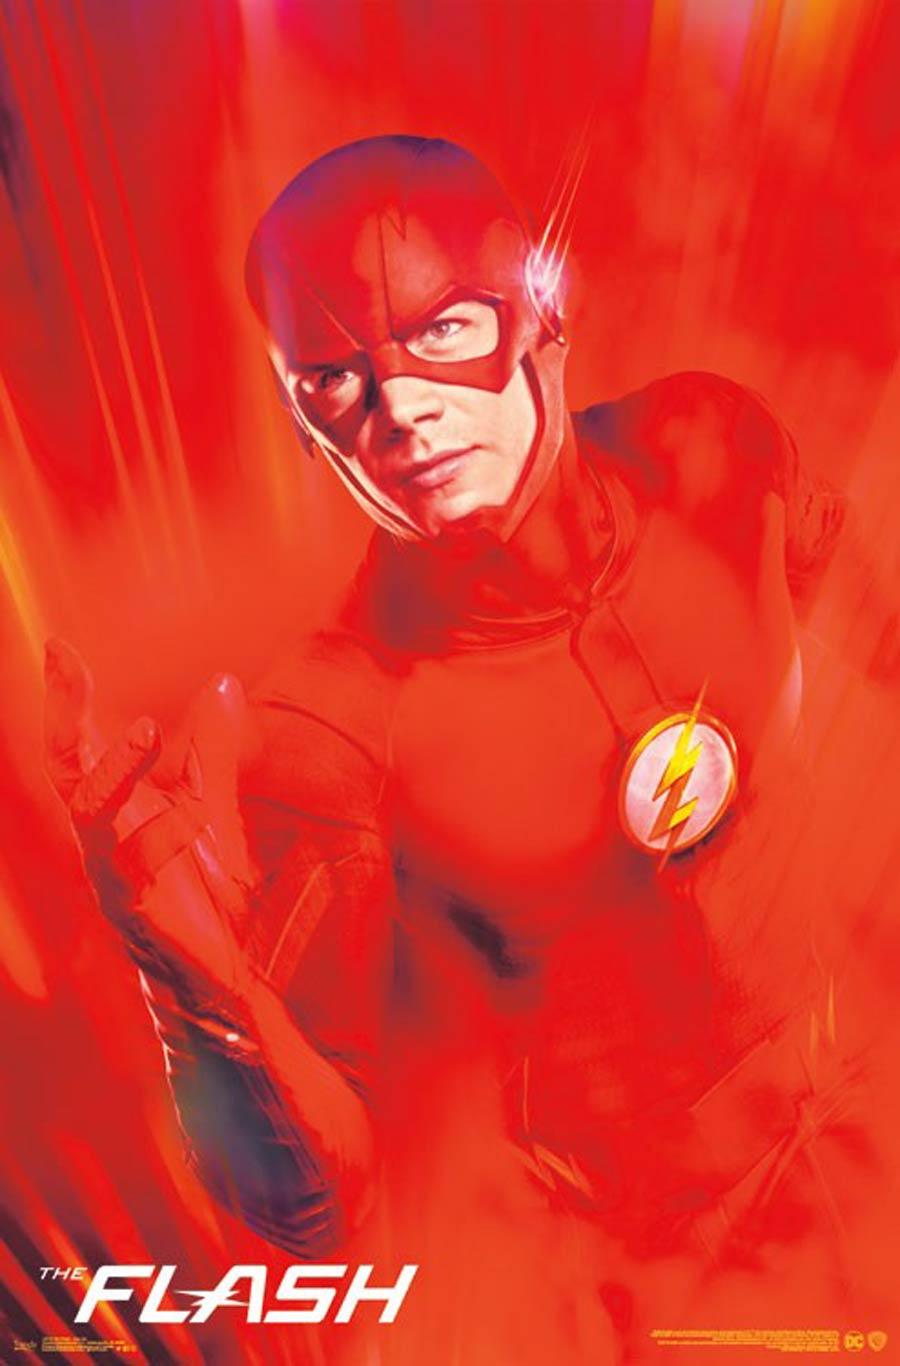 Flash Key Art Poster